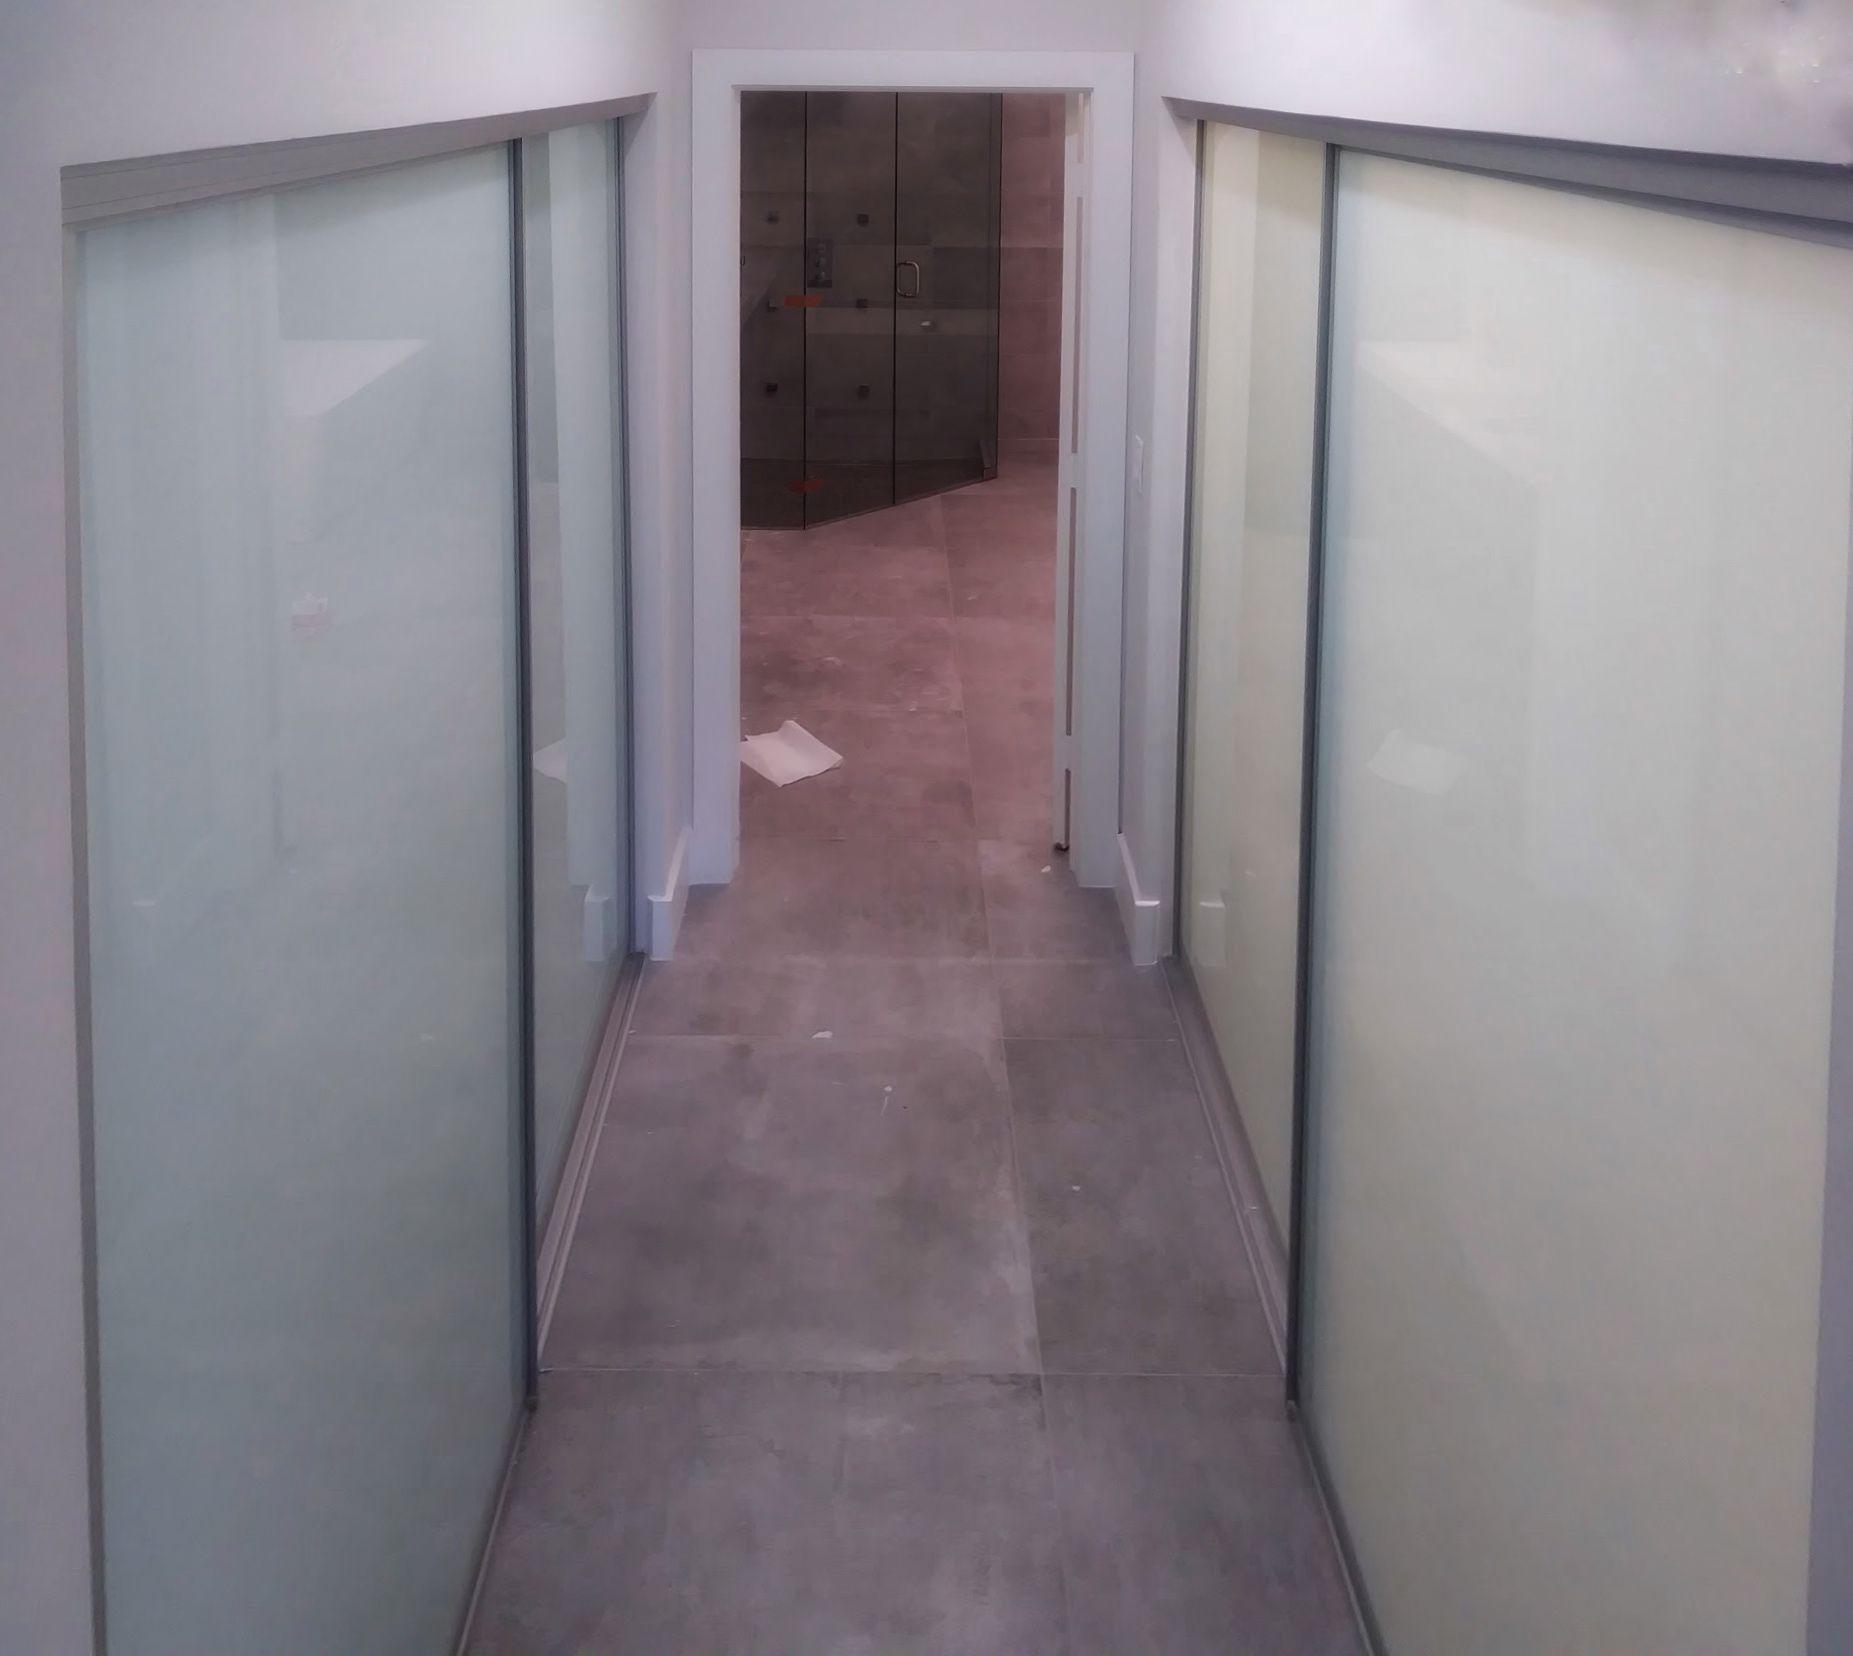 Hallway Closets With Glass Sliding Doors Frosted Glass Satin Aluminum Frames Modern Closet Doors Sliding Glass Door Glass Closet Doors